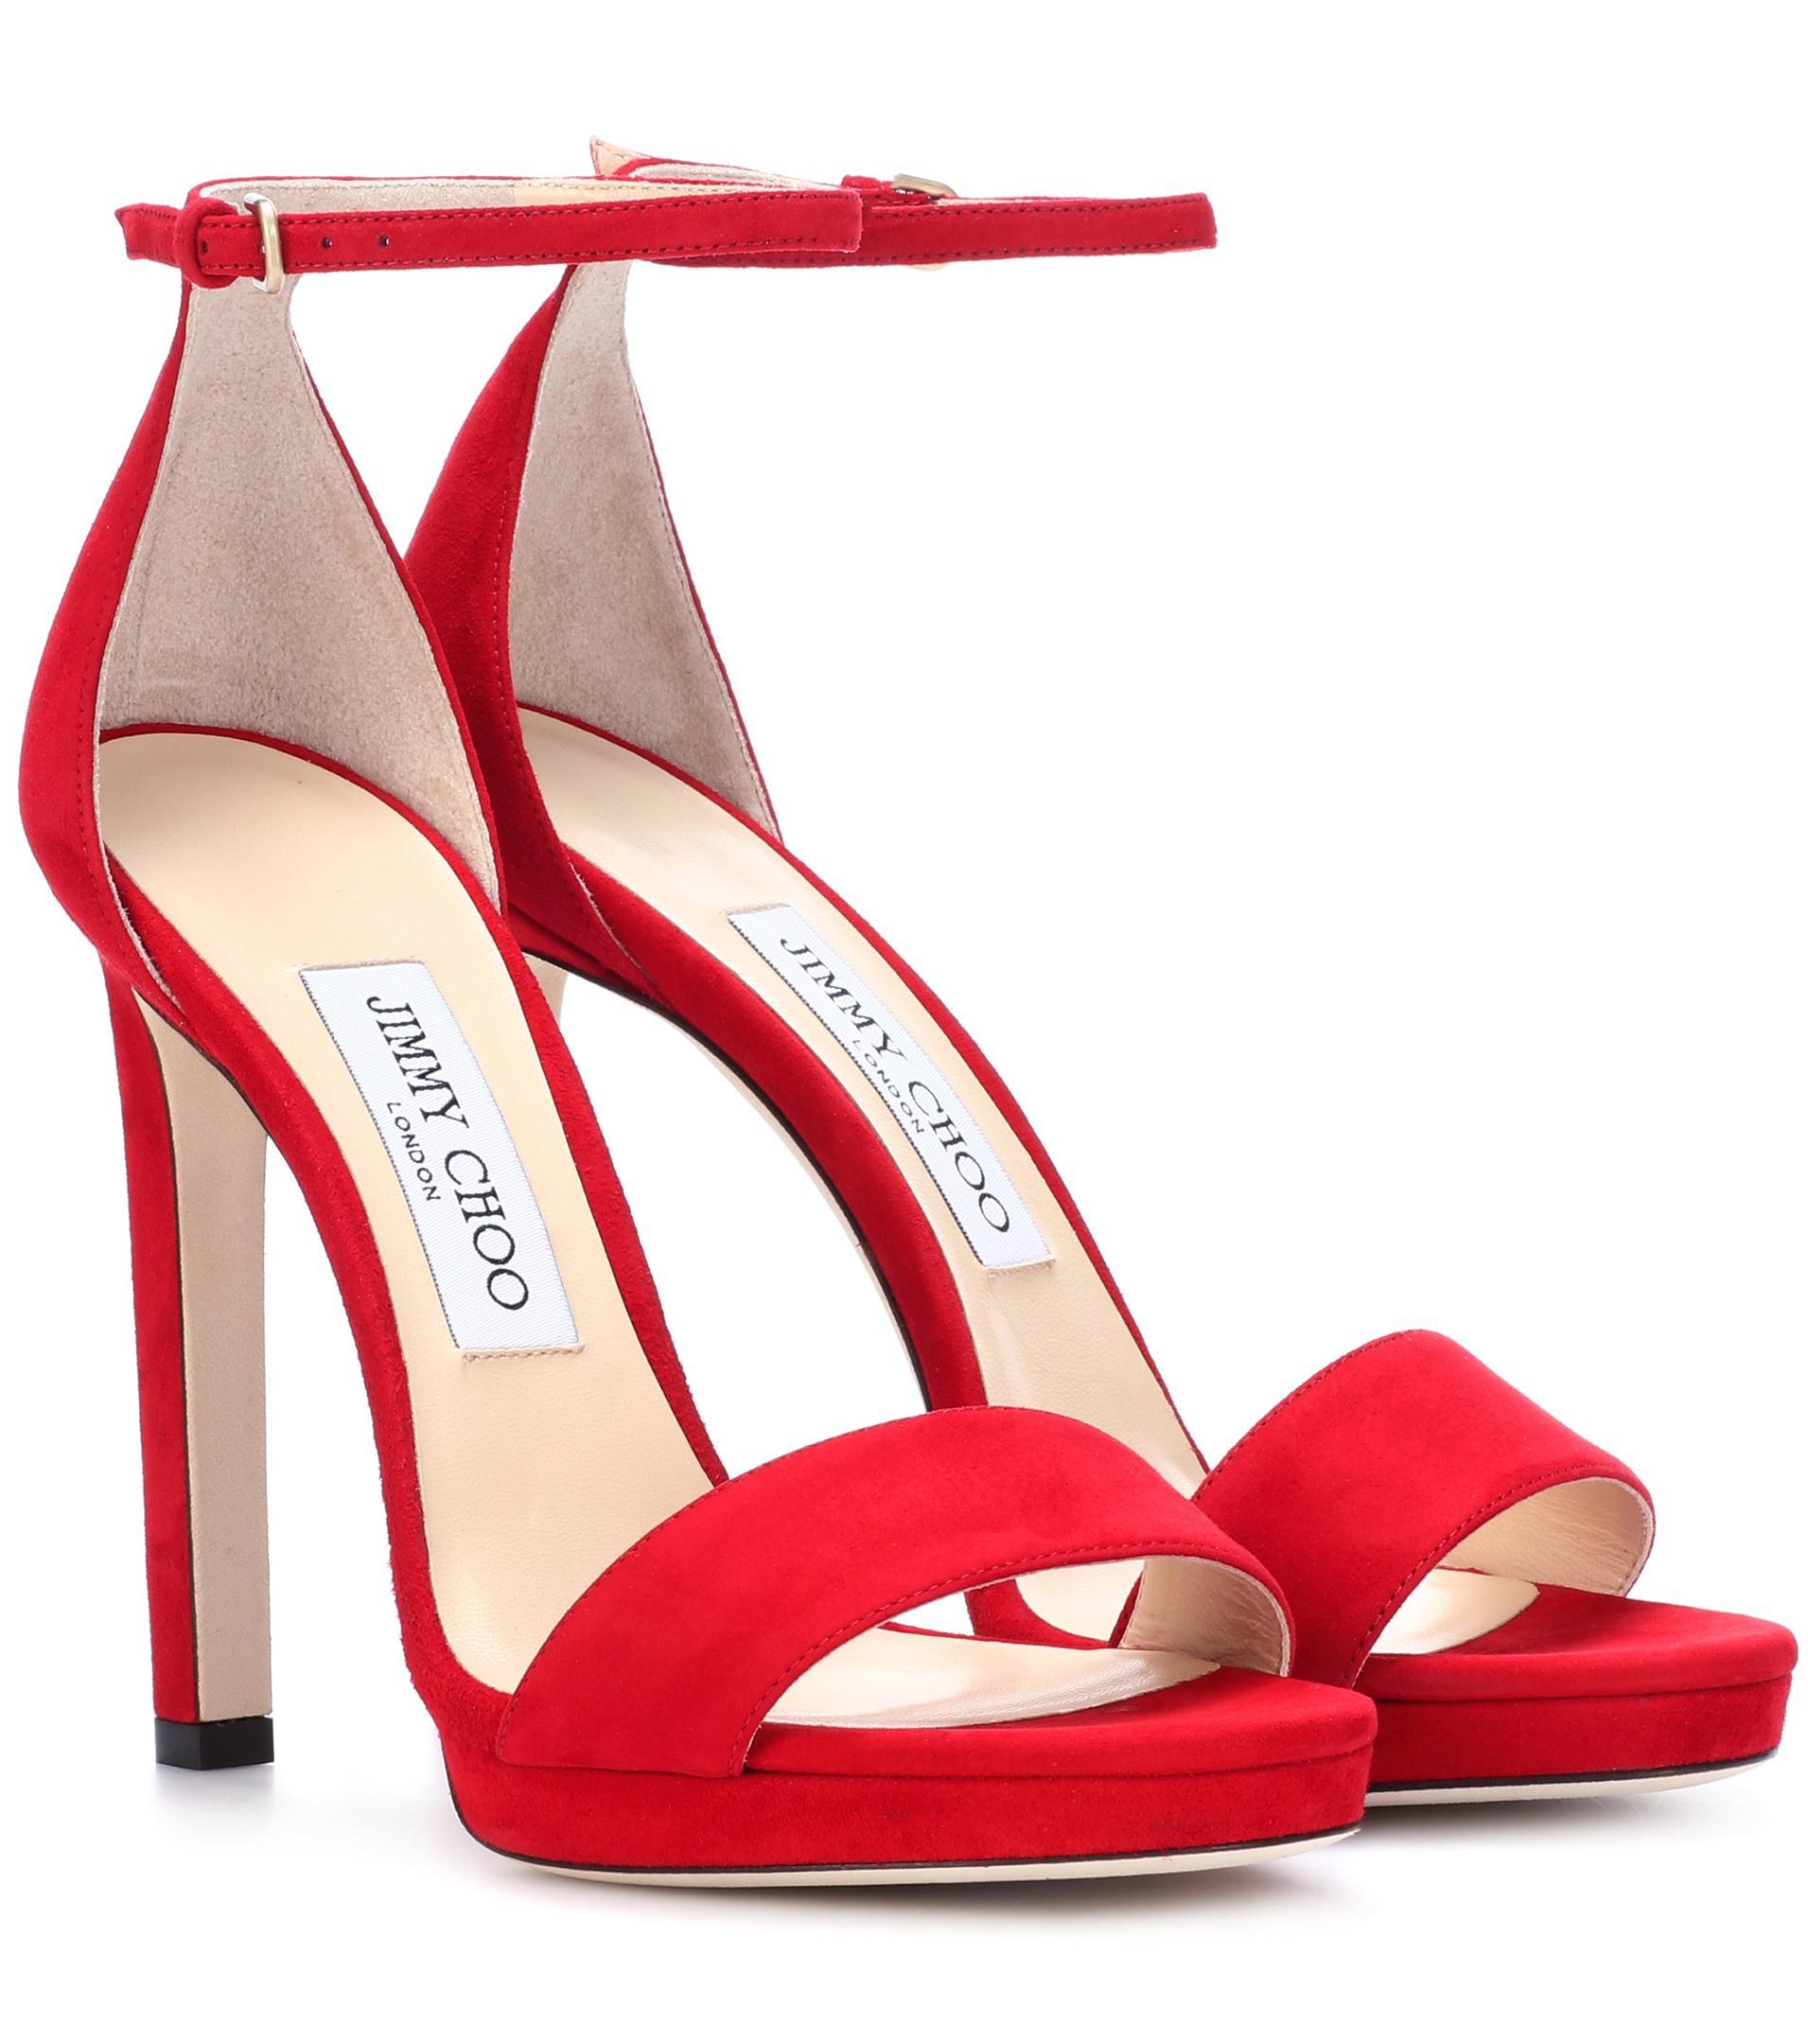 7dda563508b ... coupon code for jimmy choo red misty 120 suede sandals lyst. view  fullscreen 3edff b476d